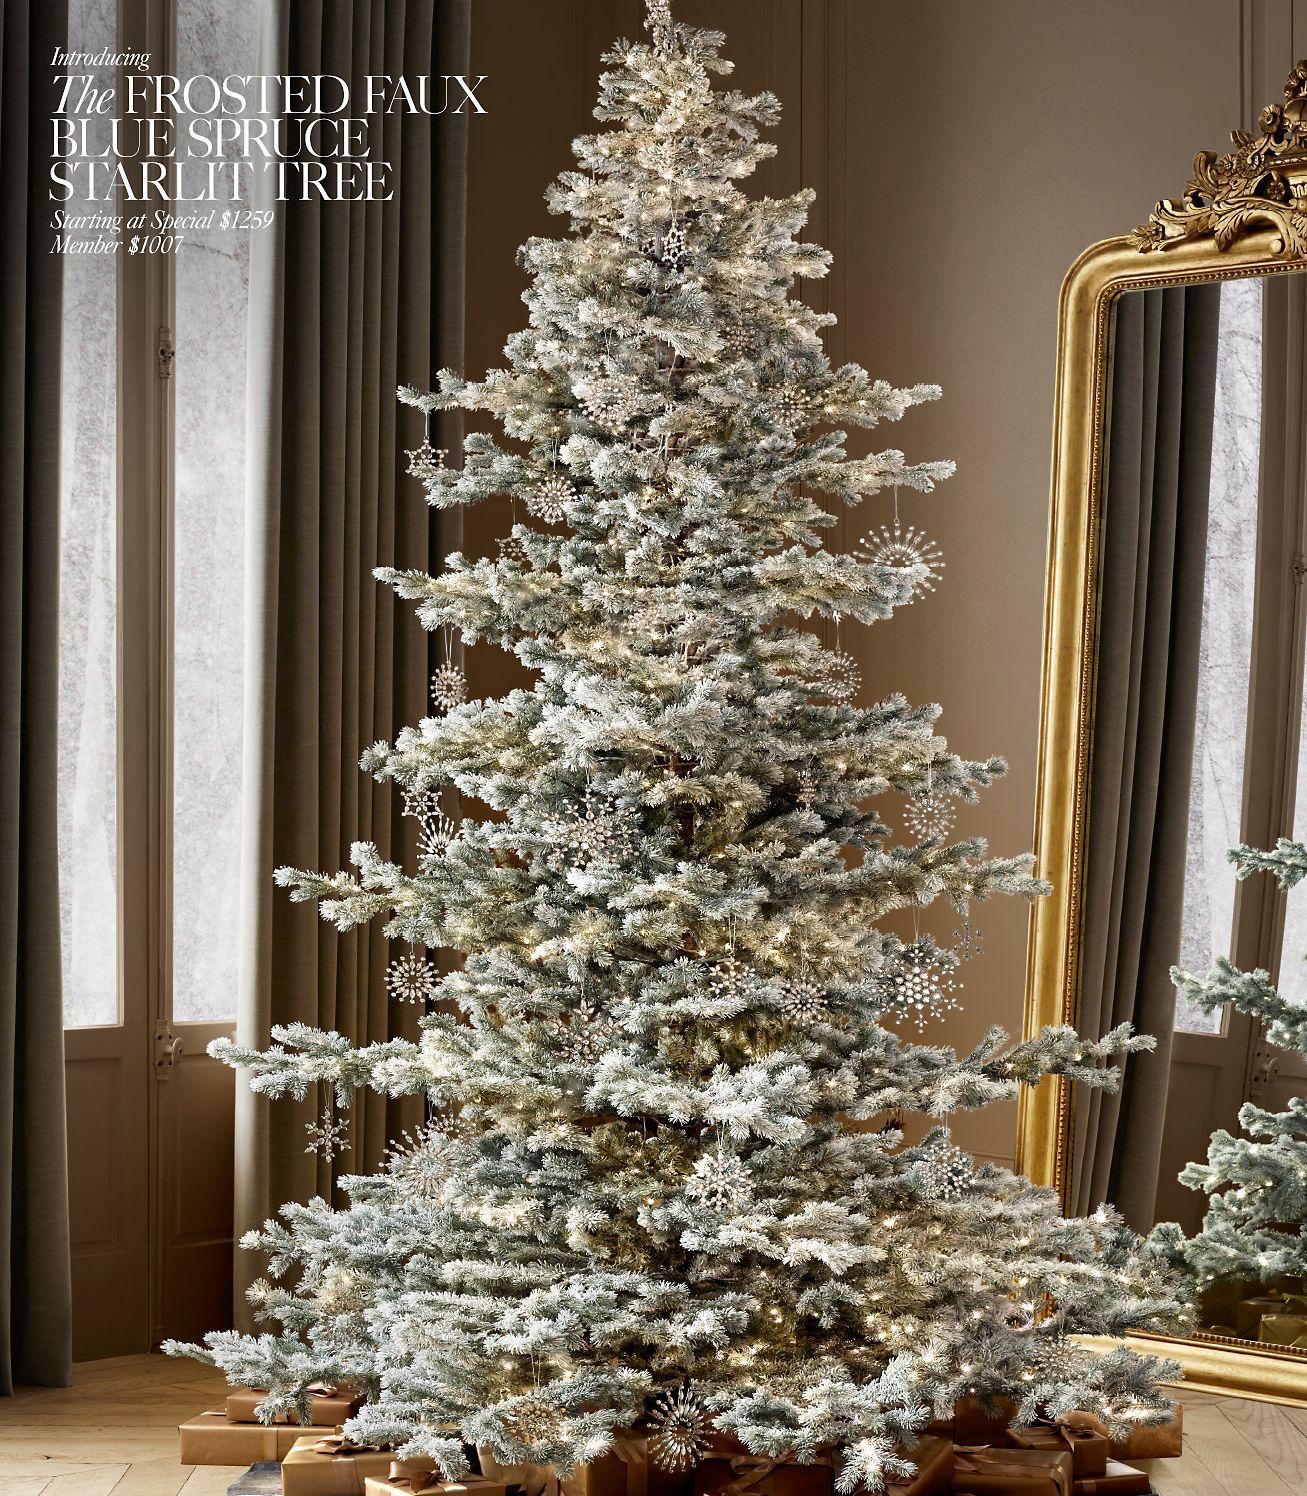 Restoration Hardware Outdoor Christmas Decorations In 2020 Faux Christmas Trees Outdoor Christmas Decorations Flocked Christmas Trees